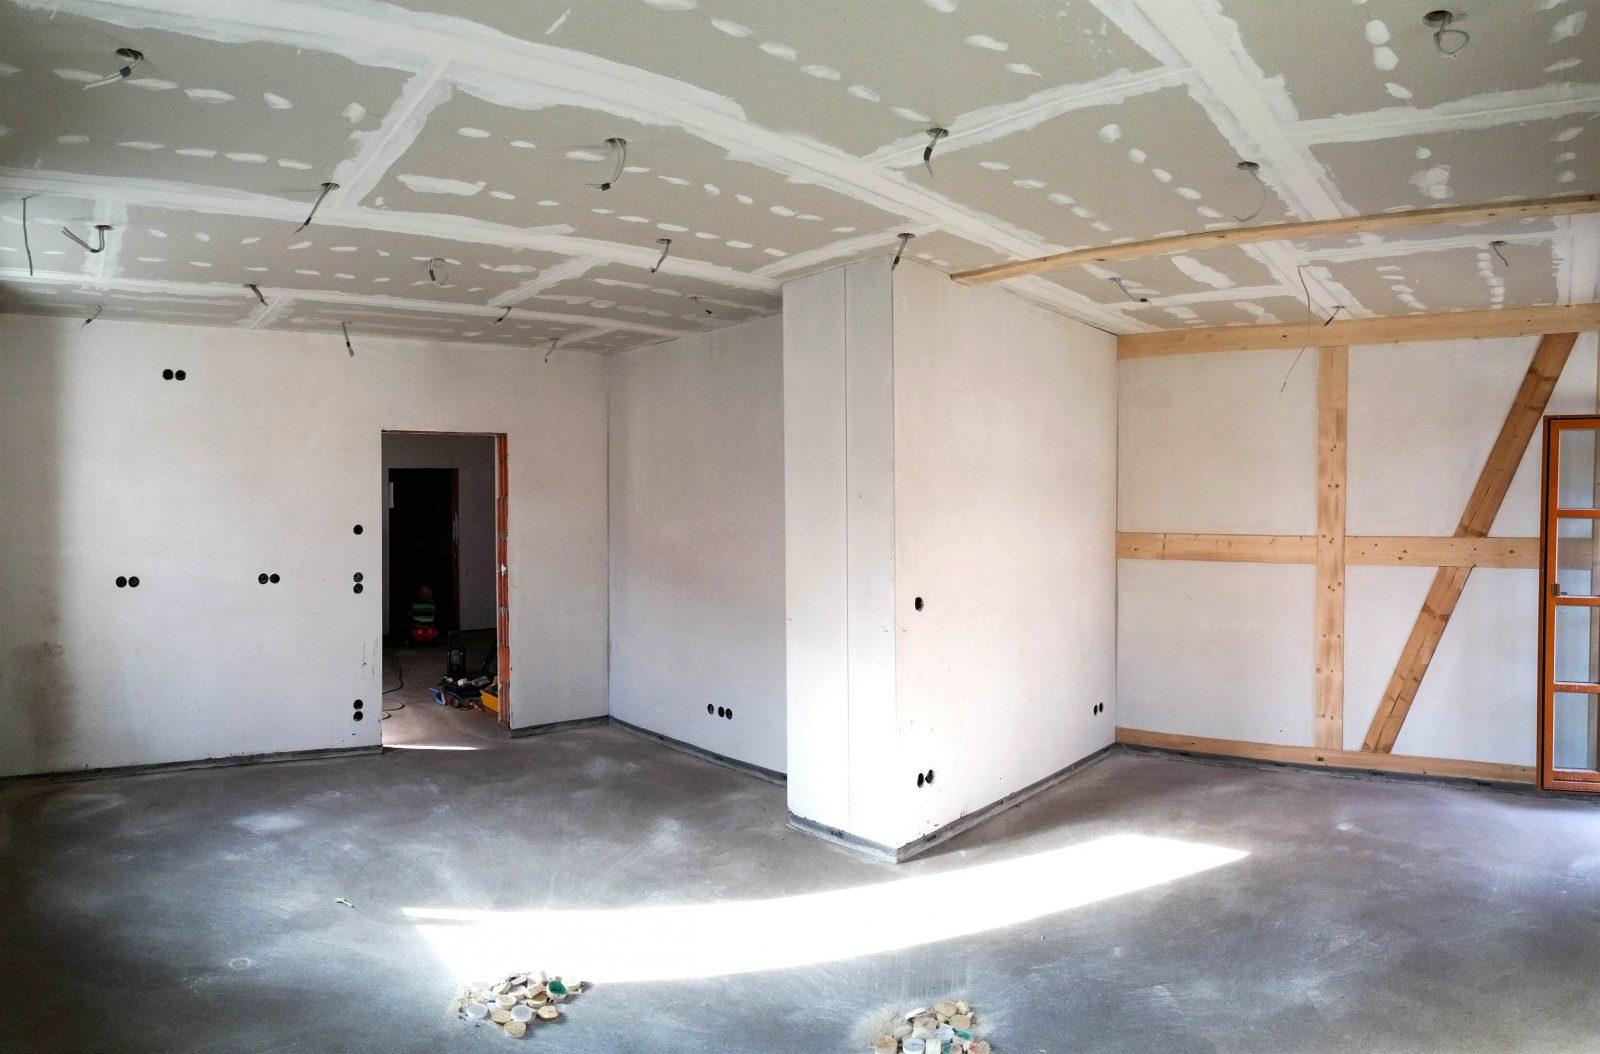 Anordnung Led Spots Wohnzimmer  Haus Design Ideen